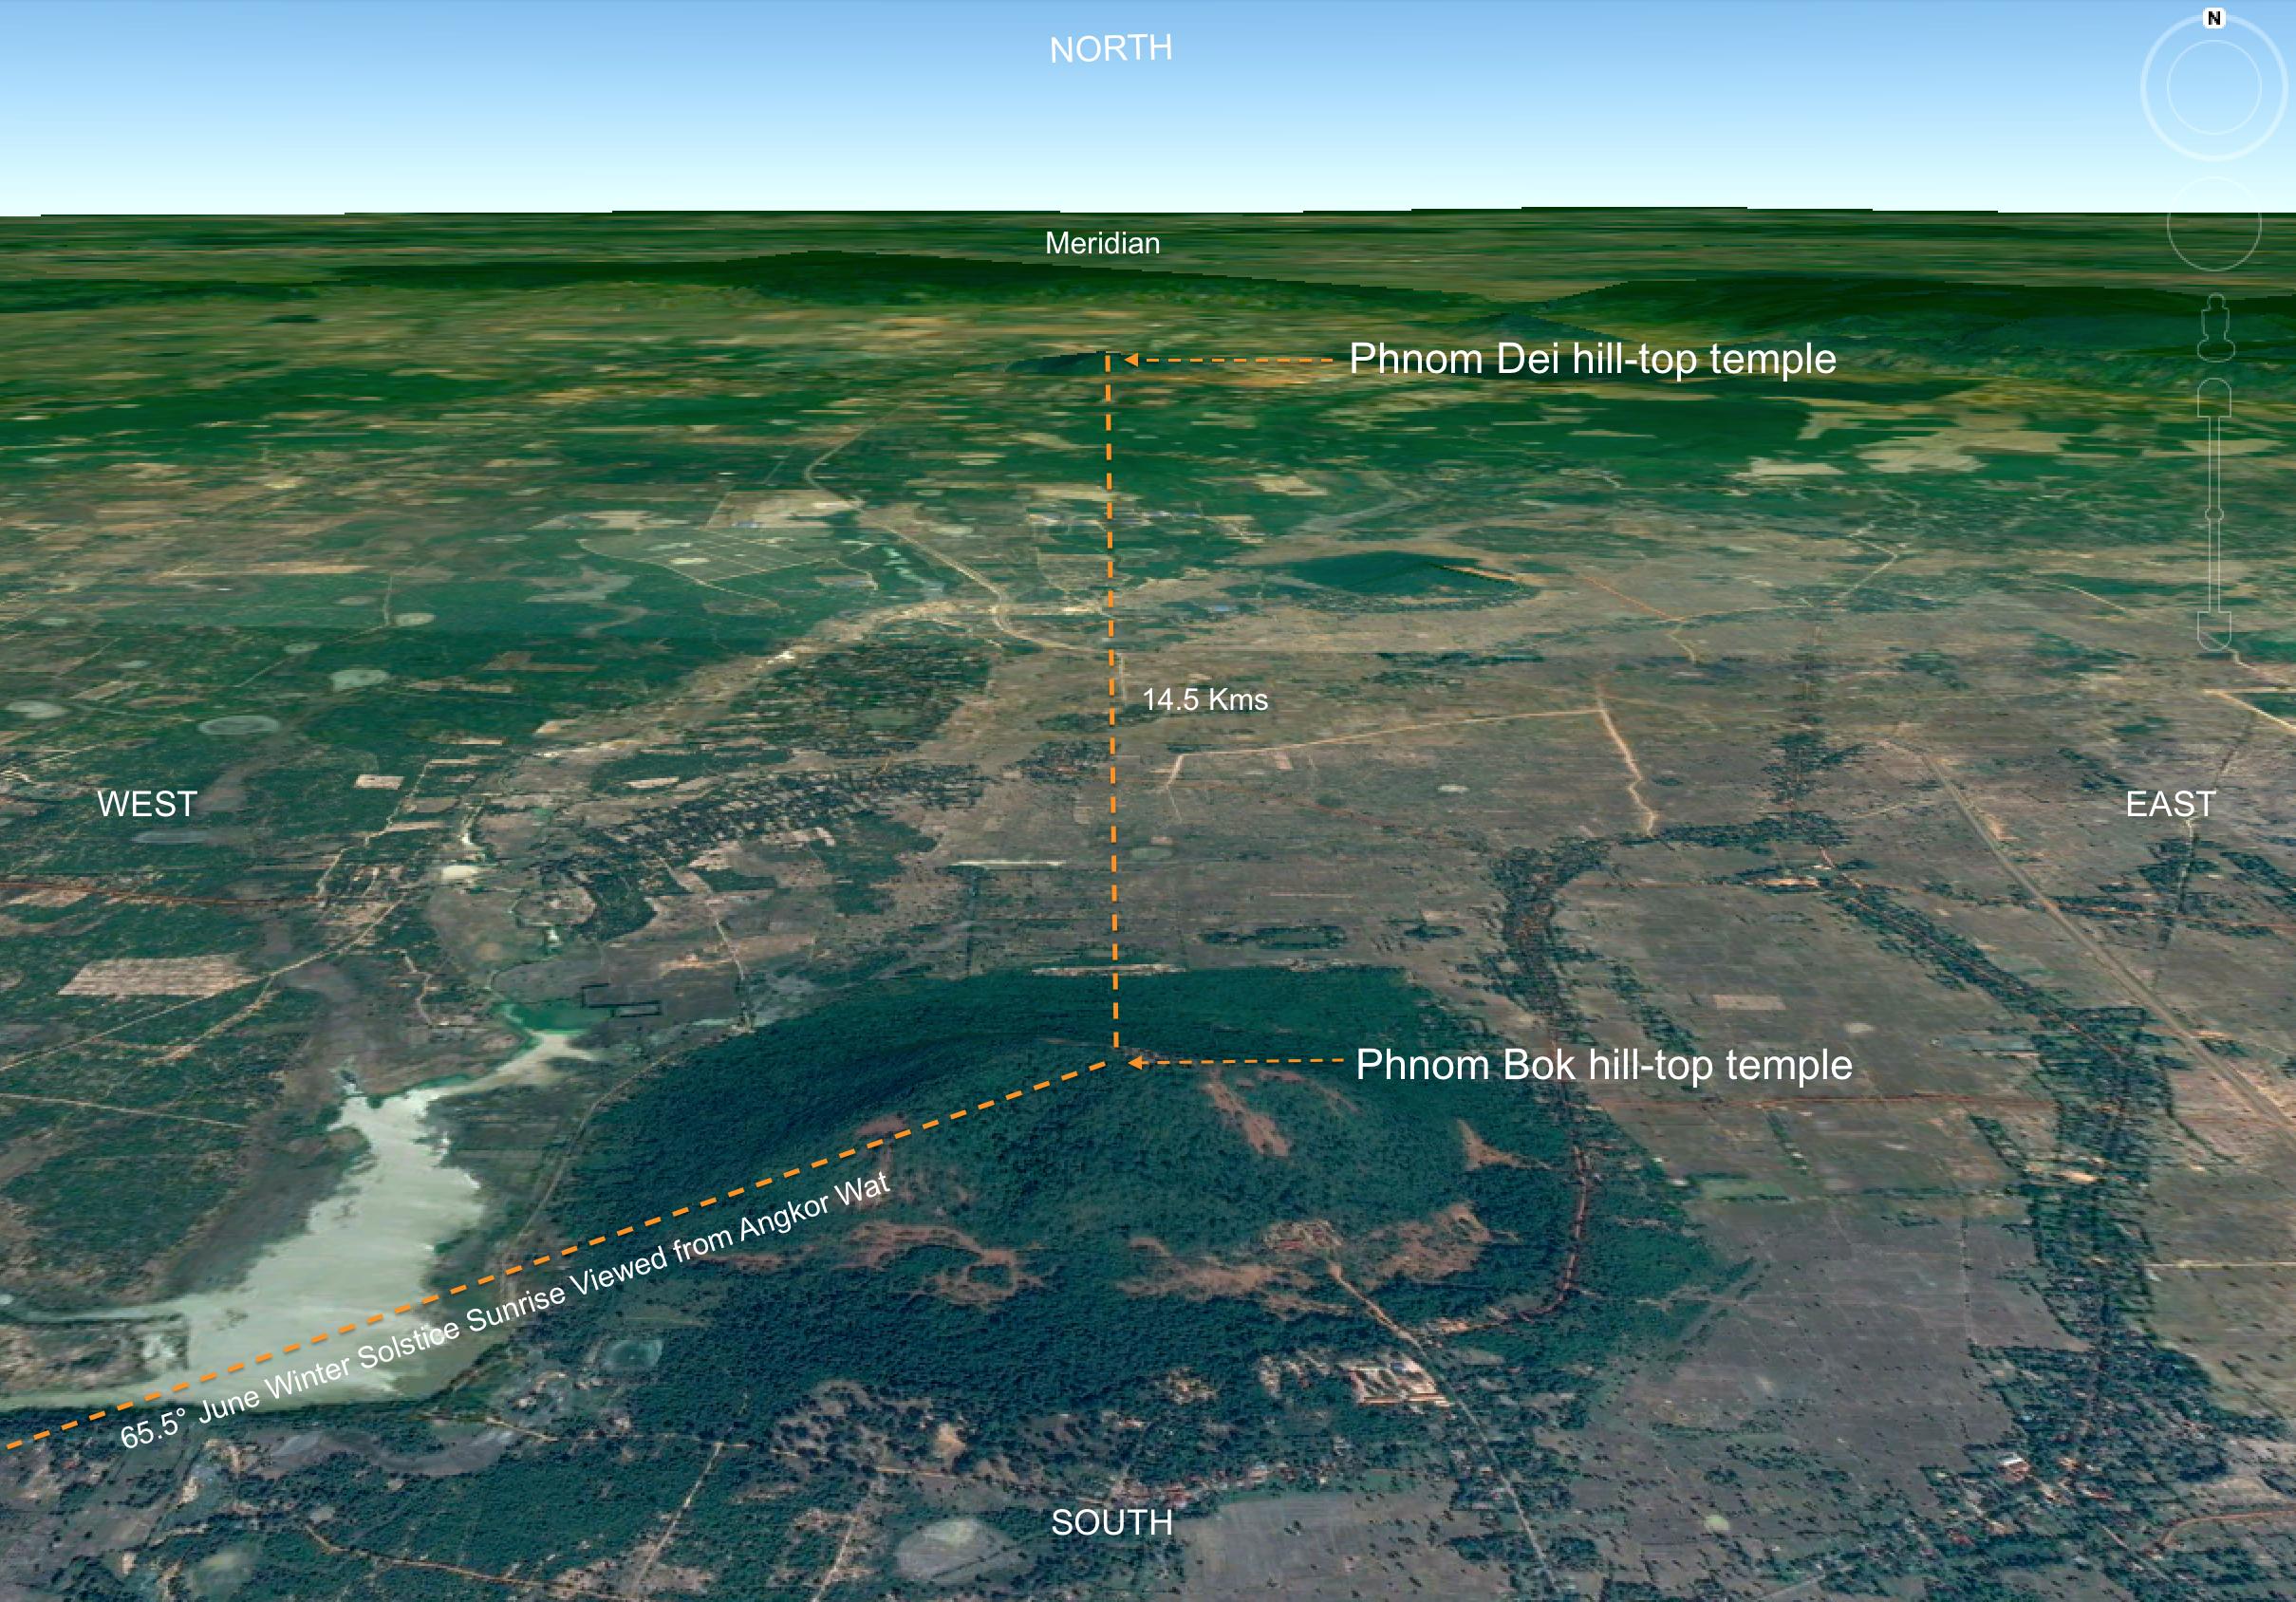 Figure 4. Phnom Bok and Phnom Dei hill-top temples: